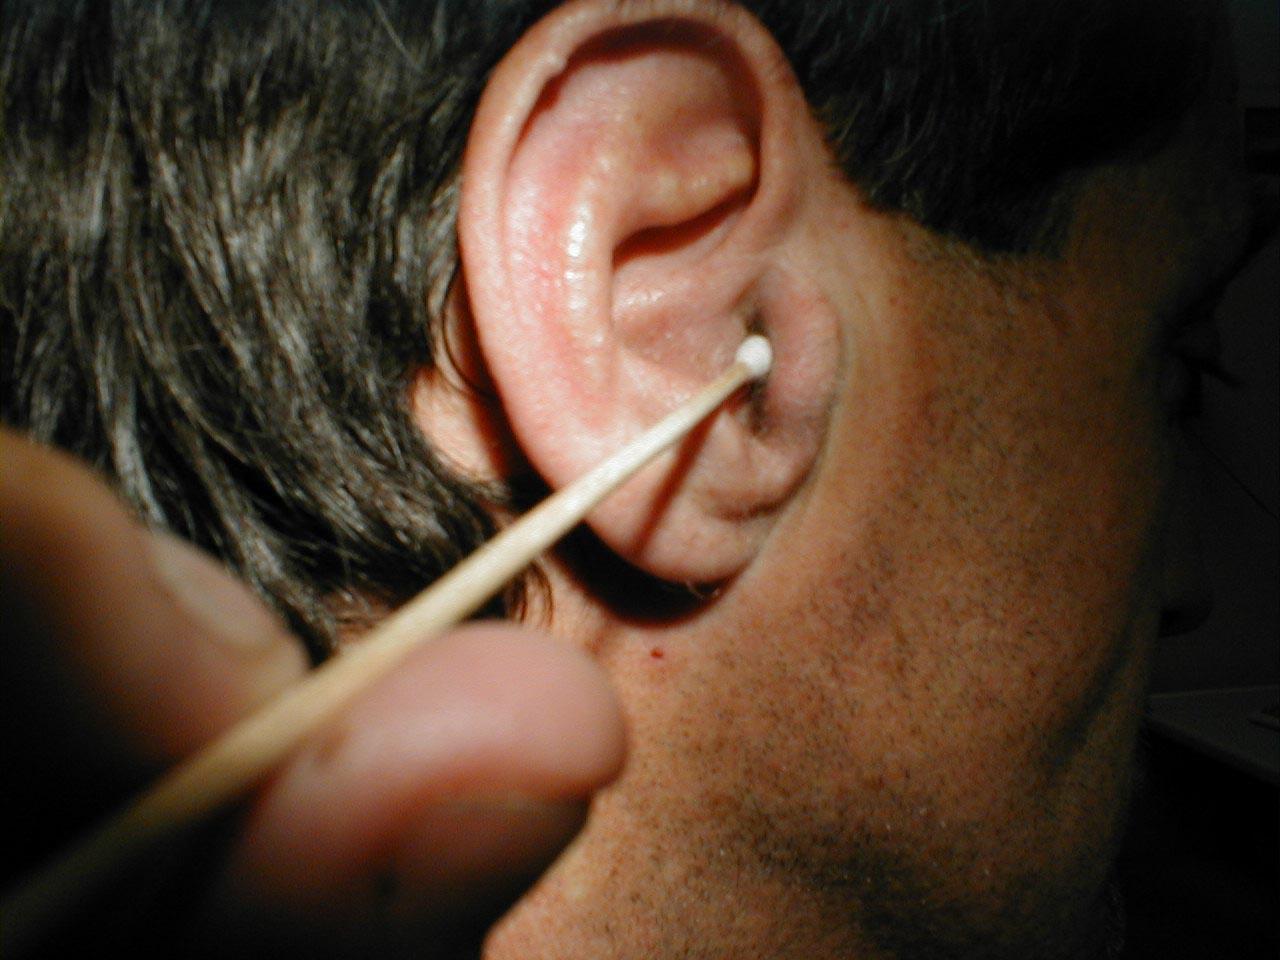 Чем прогреть ухо в домашних условиях